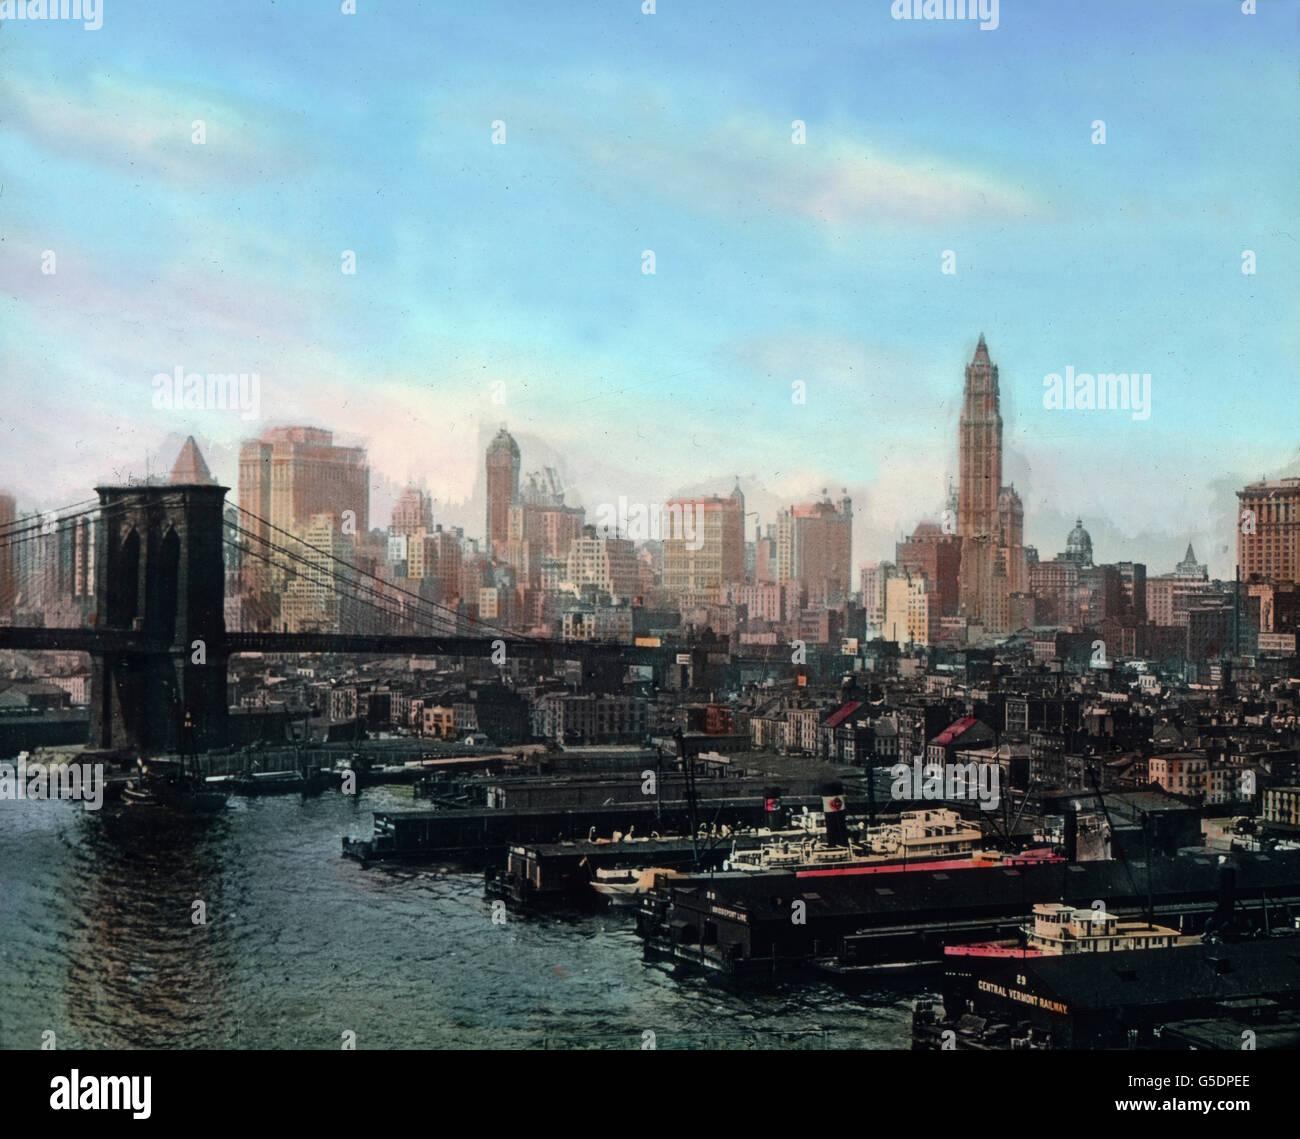 Die Ponte di Brooklyn a New York mit Blick auf Manhattan. America del Nord a335e2919281